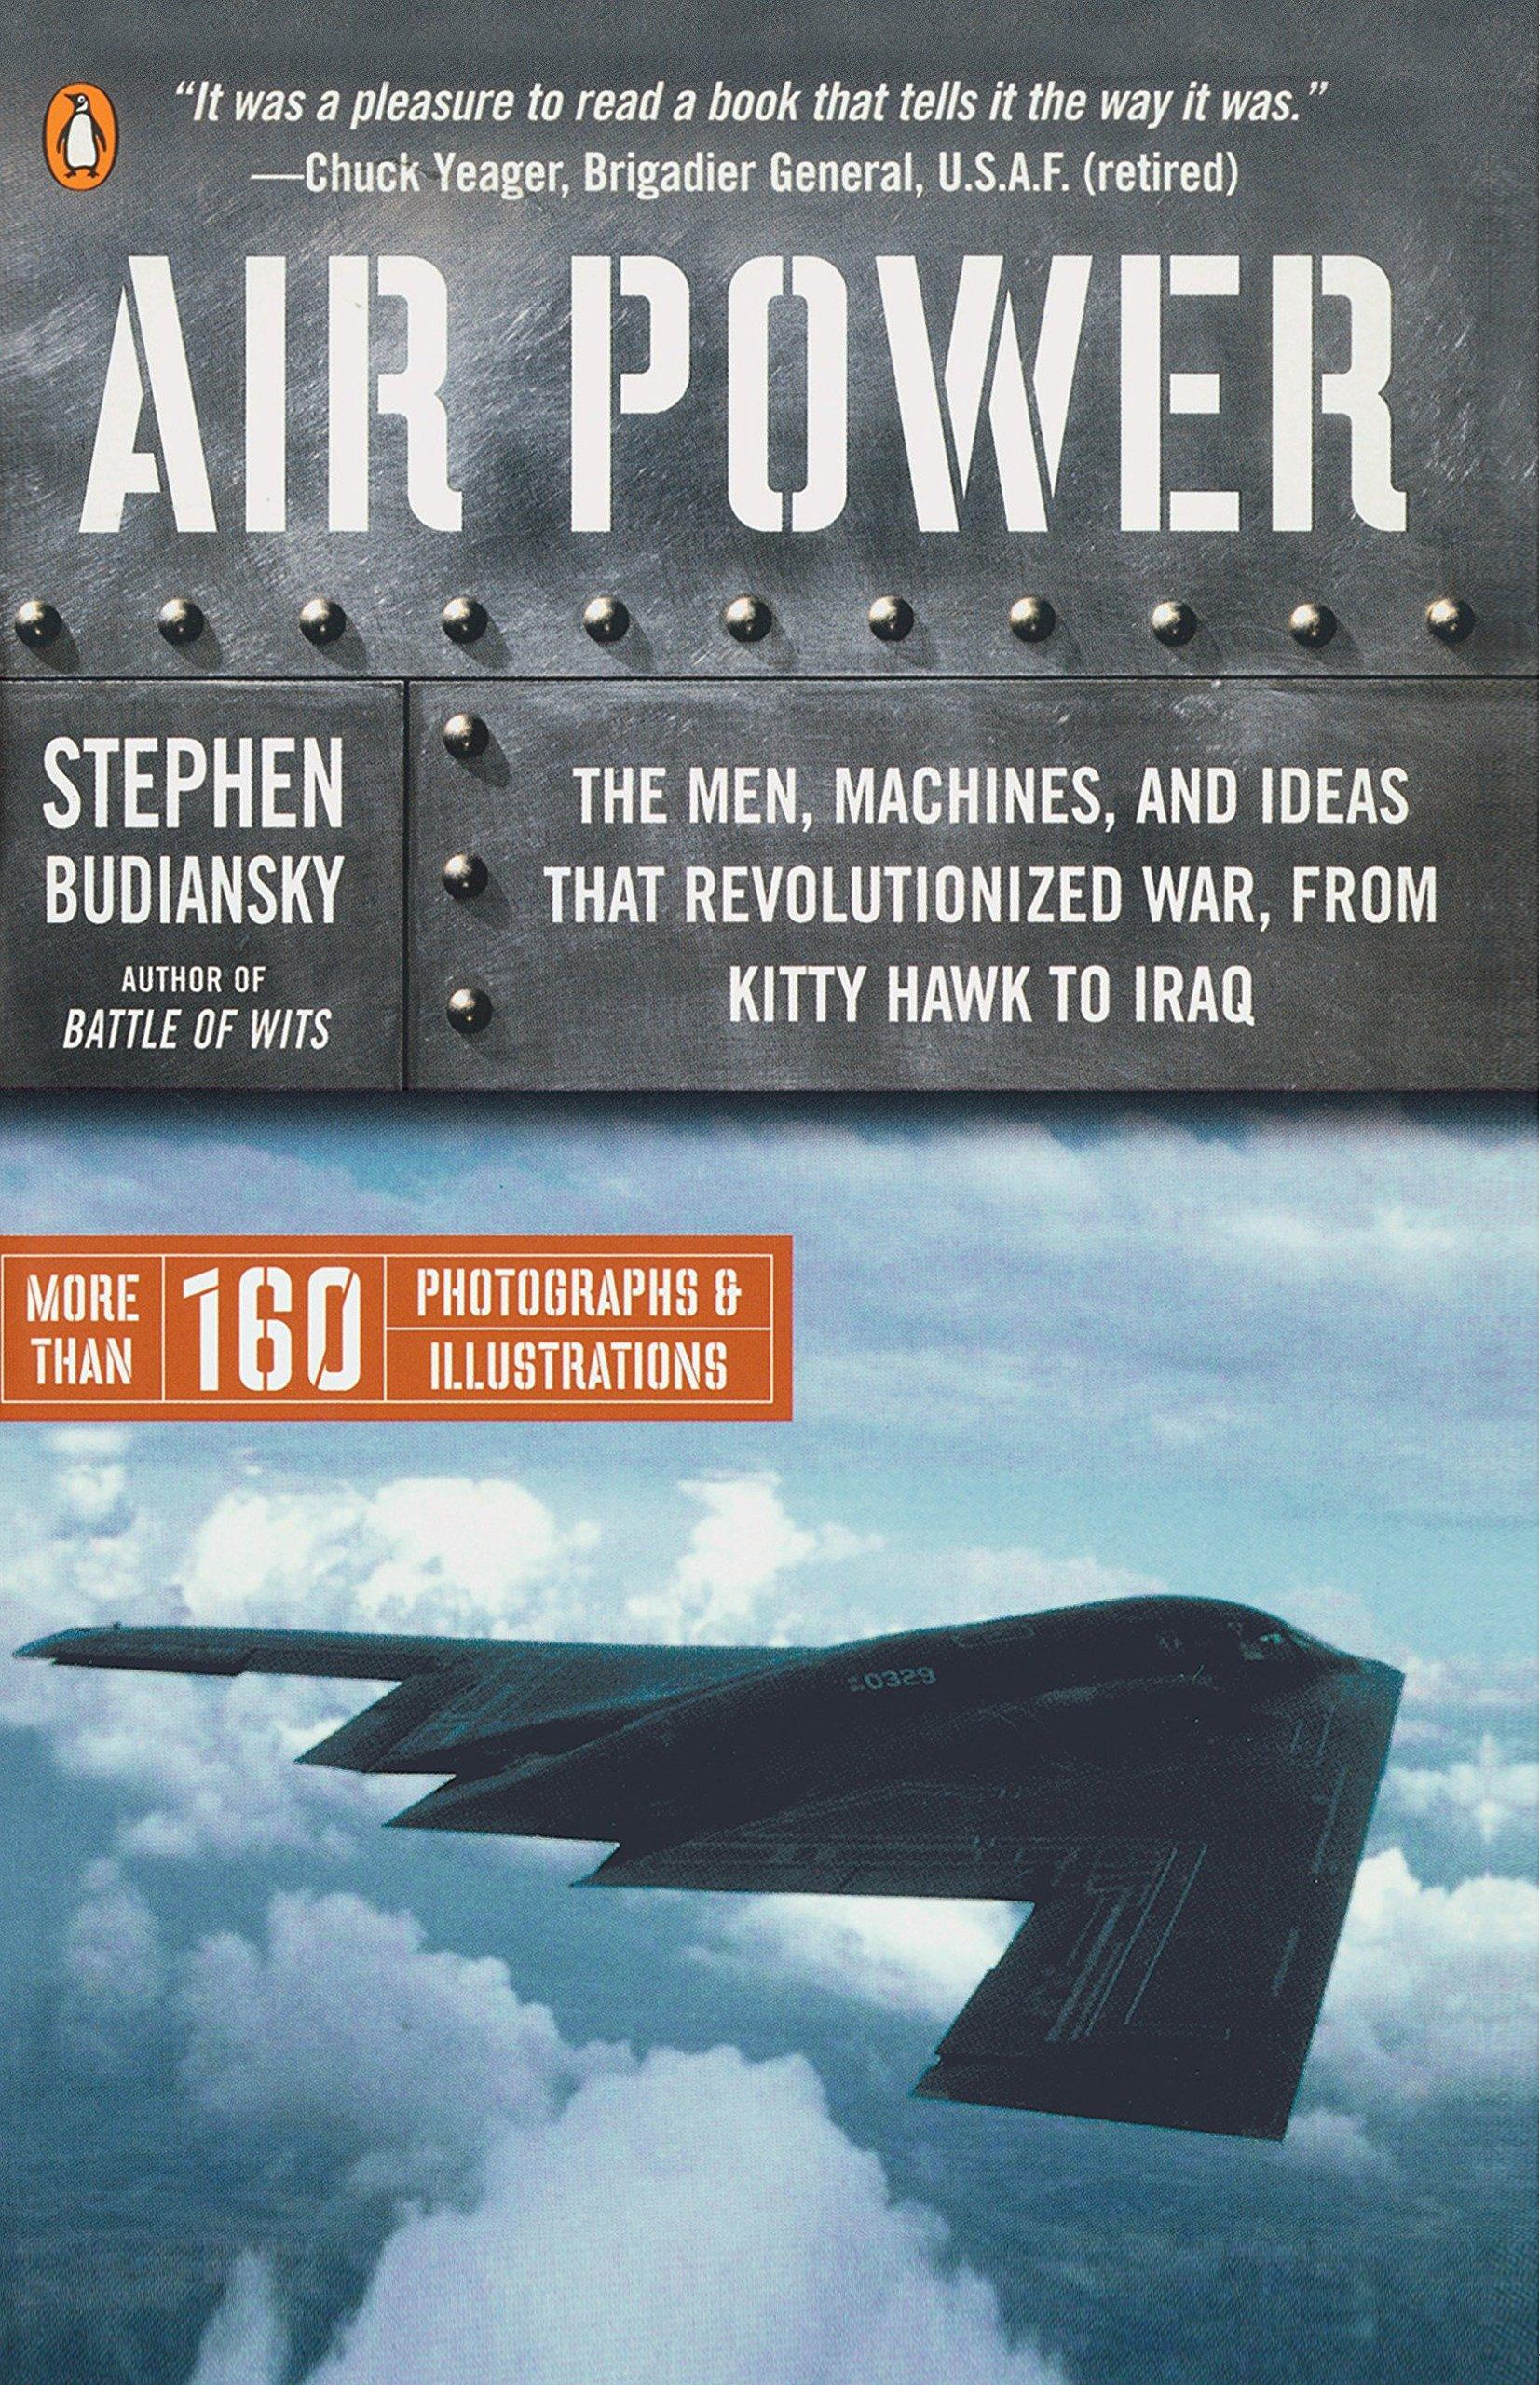 Air Power: The Men, Machines, and Ideas That Revolutionized War, from Kitty  Hawk to Iraq: Stephen Budiansky: 9780143034742: Amazon.com: Books